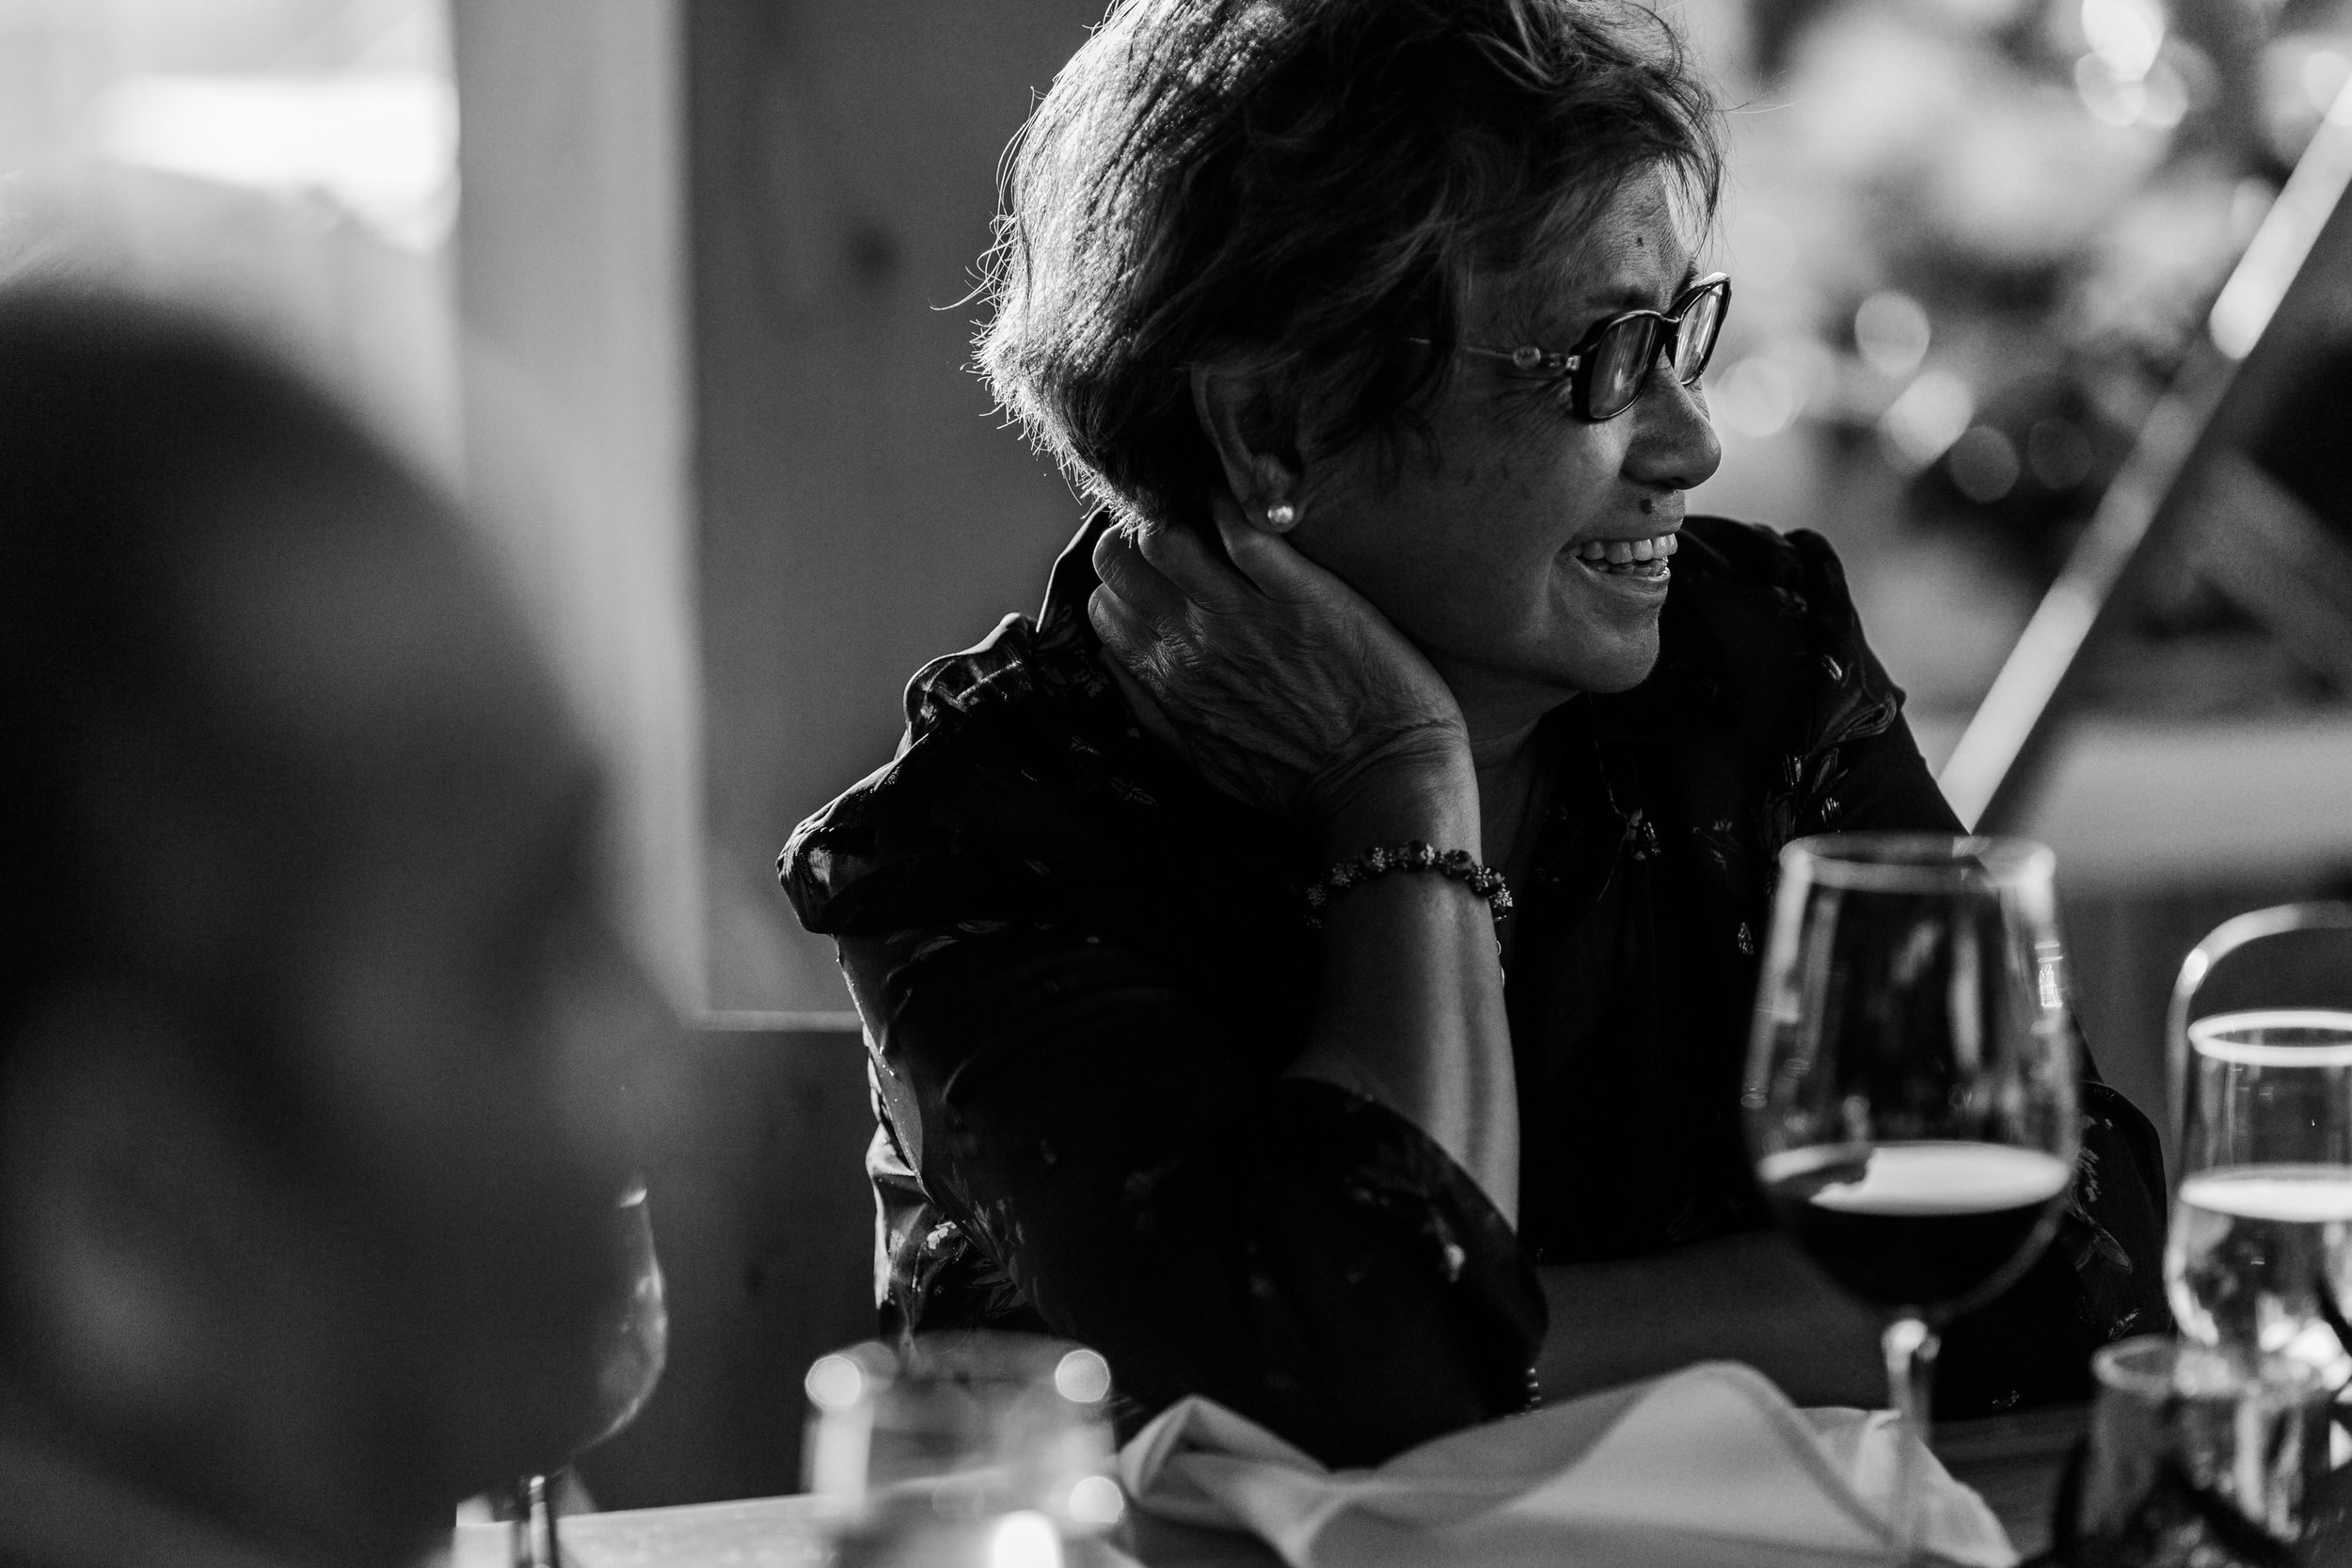 Squamish Wedding Photographer - Sea to Sky Gondola Wedding Photos -  Vancouver Wedding Photographer & Videographer - Sunshine Coast Wedding Photos - Sunshine Coast Wedding Photographer - Jennifer Picard Photography - IMG_4757.jpg